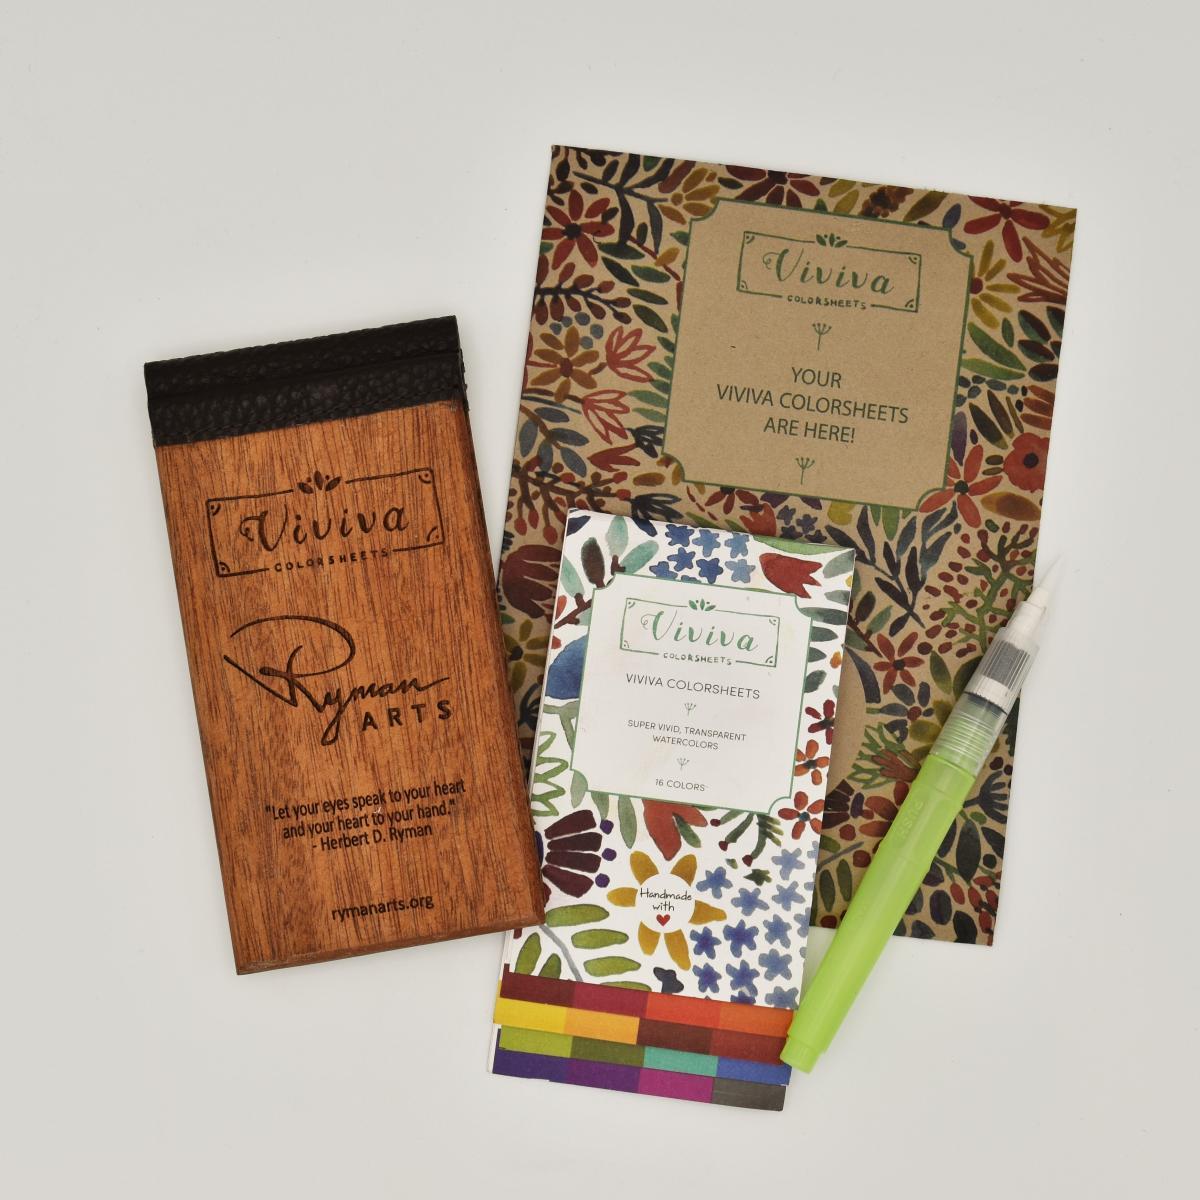 Shop the Ryman Arts Watercolor Travel Gift Set